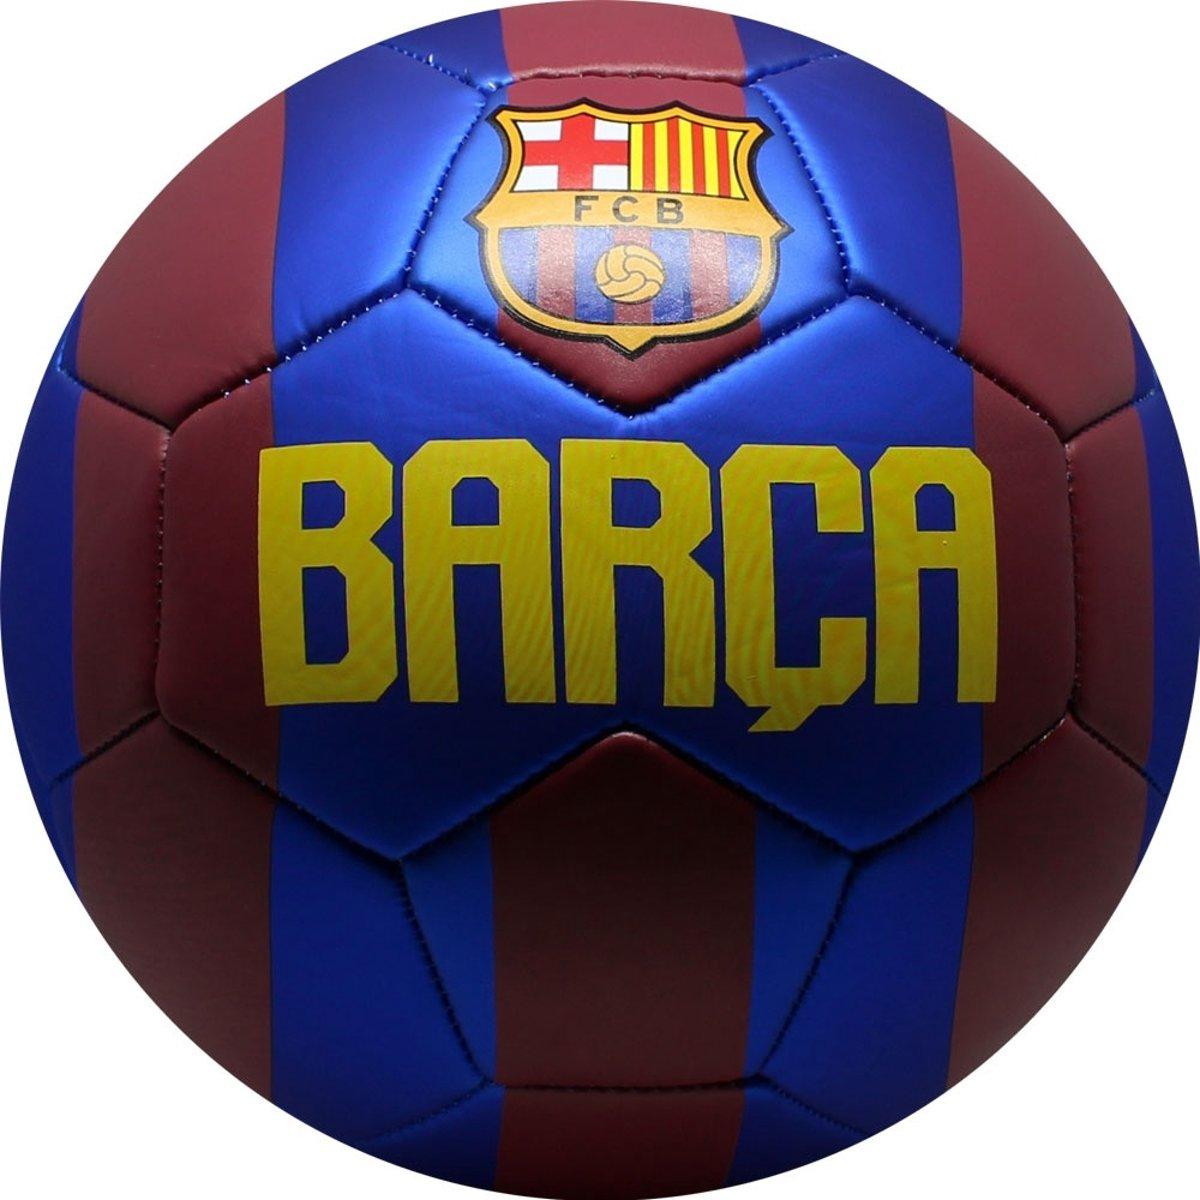 5ece00768f7 bol.com | FC Barcelona artikelen kopen? Alle artikelen online